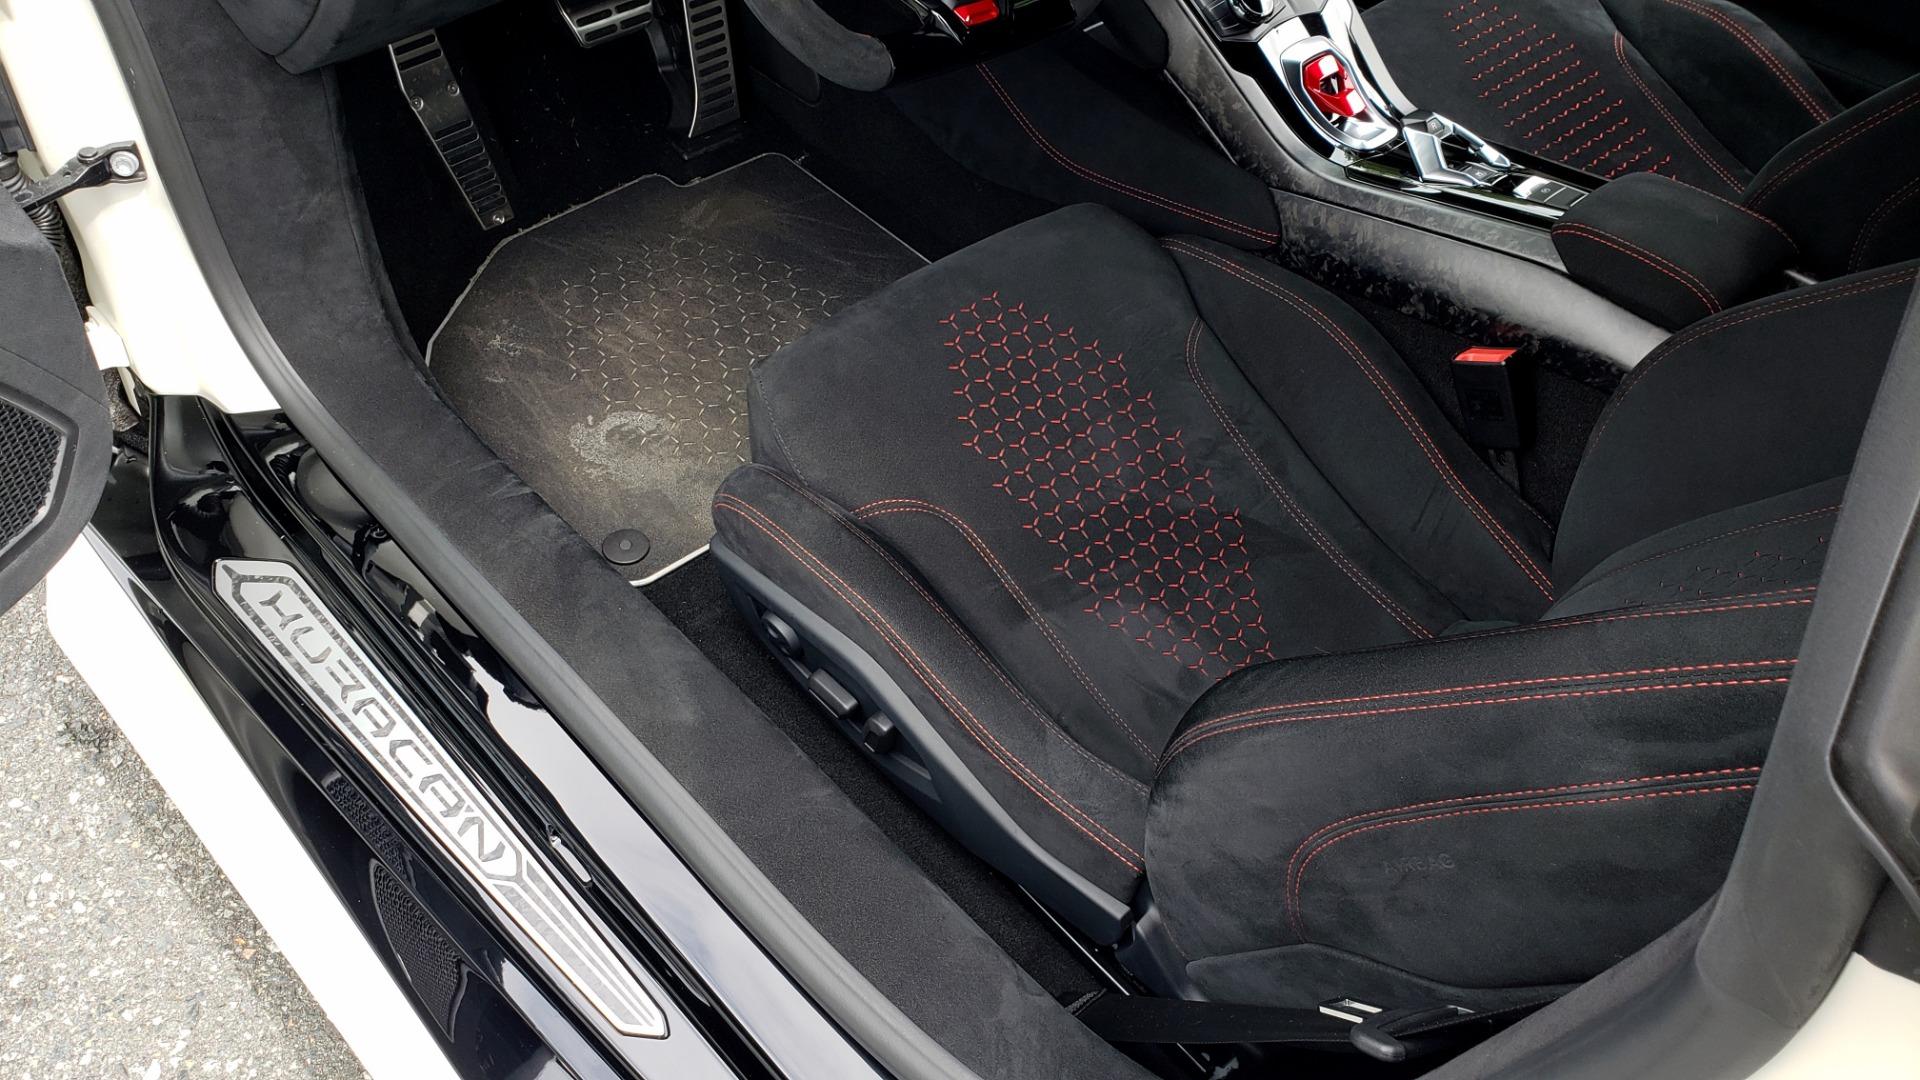 Used 2018 Lamborghini HURACAN PERFORMANTE 5.2L V10 / 630HP / 7-SPD AUTO / AWD / NAV / PREM SND for sale $269,995 at Formula Imports in Charlotte NC 28227 57